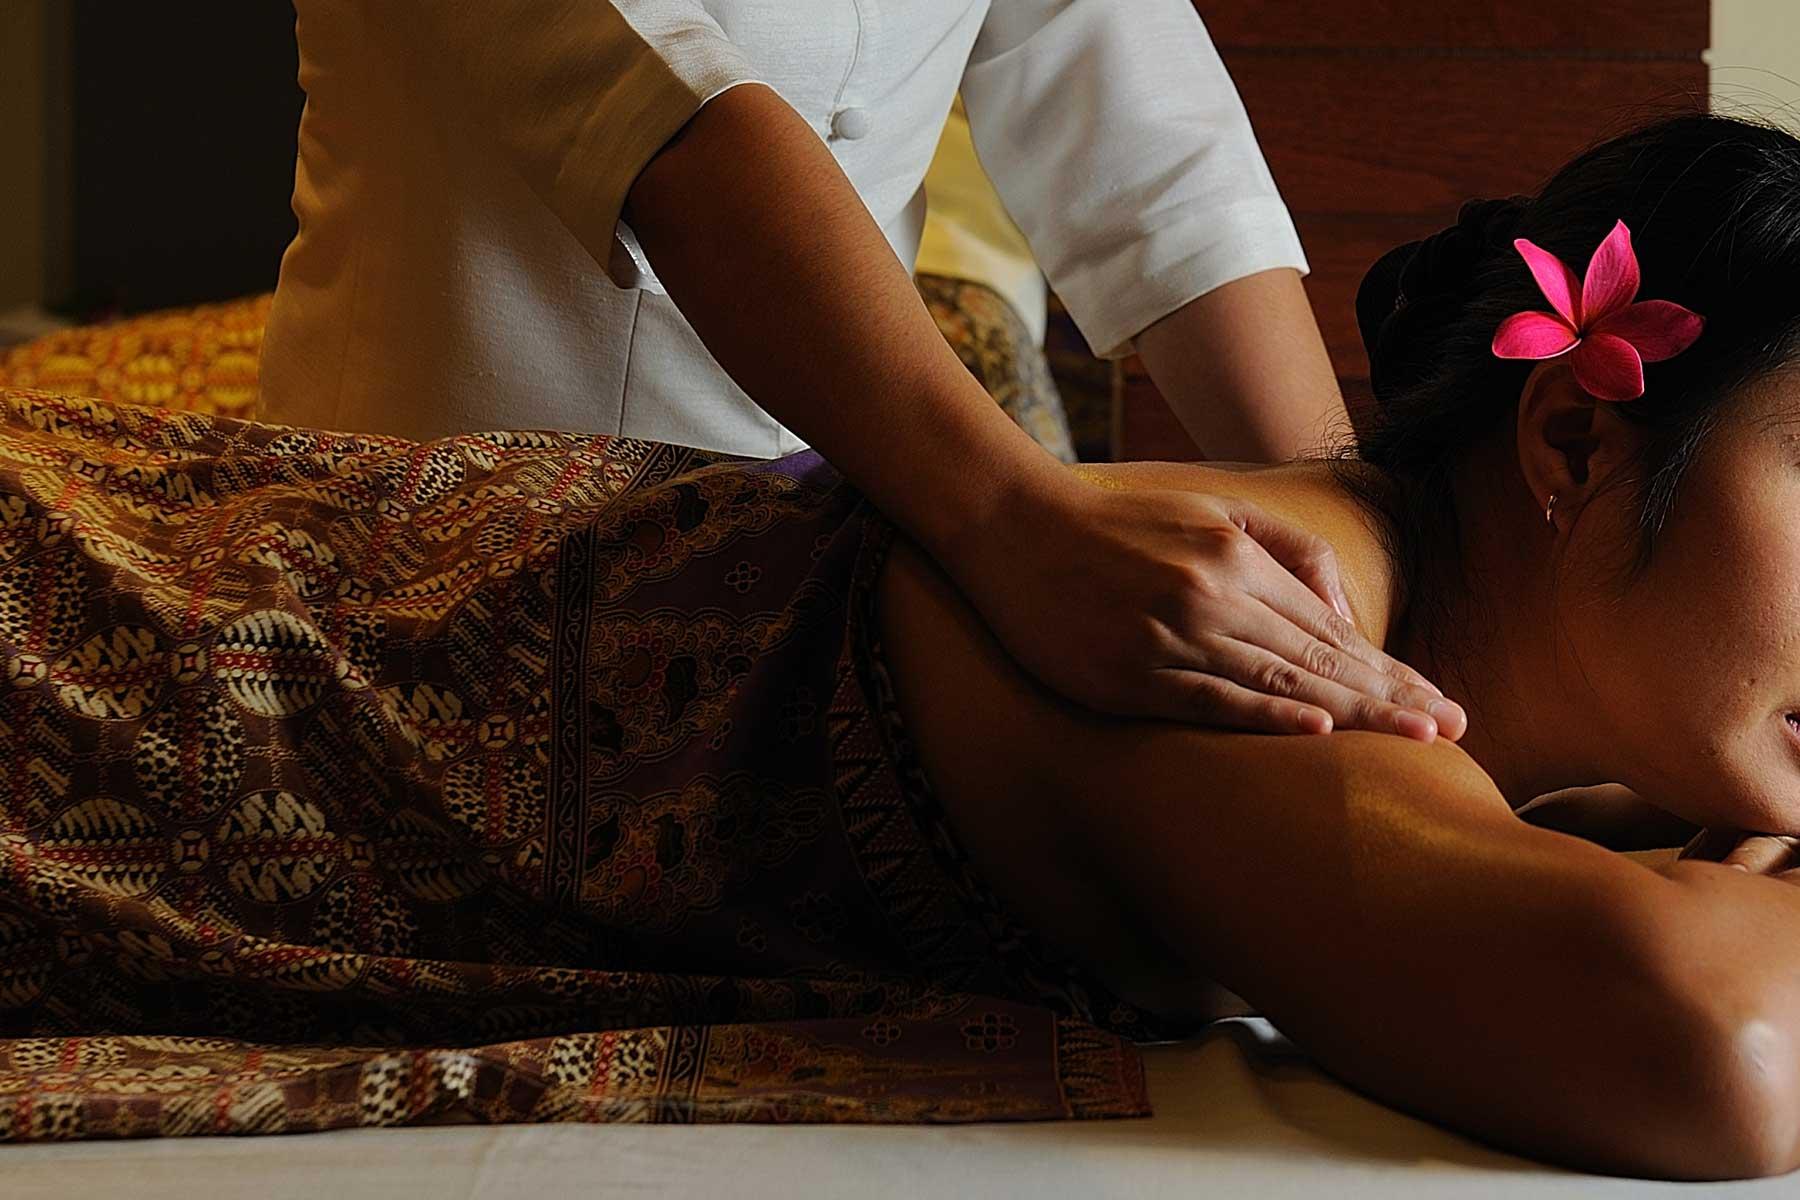 frodige kvinder thai massage lemvig